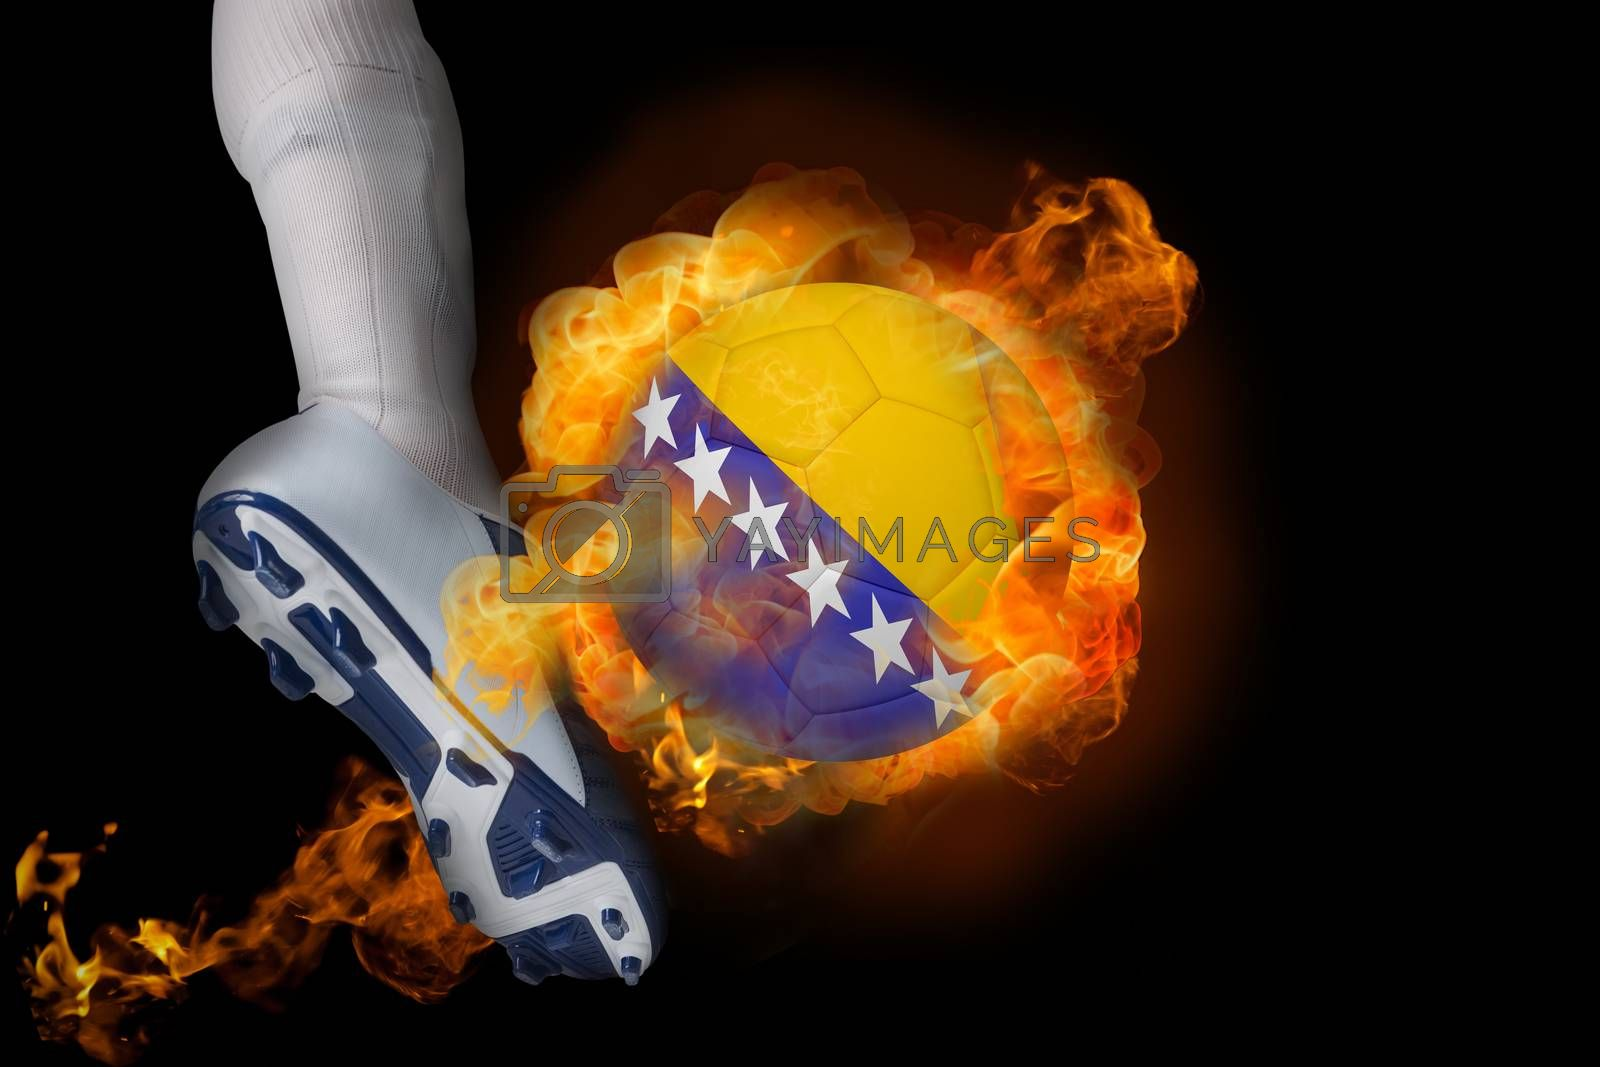 Football player kicking flaming bosnia ball by Wavebreakmedia